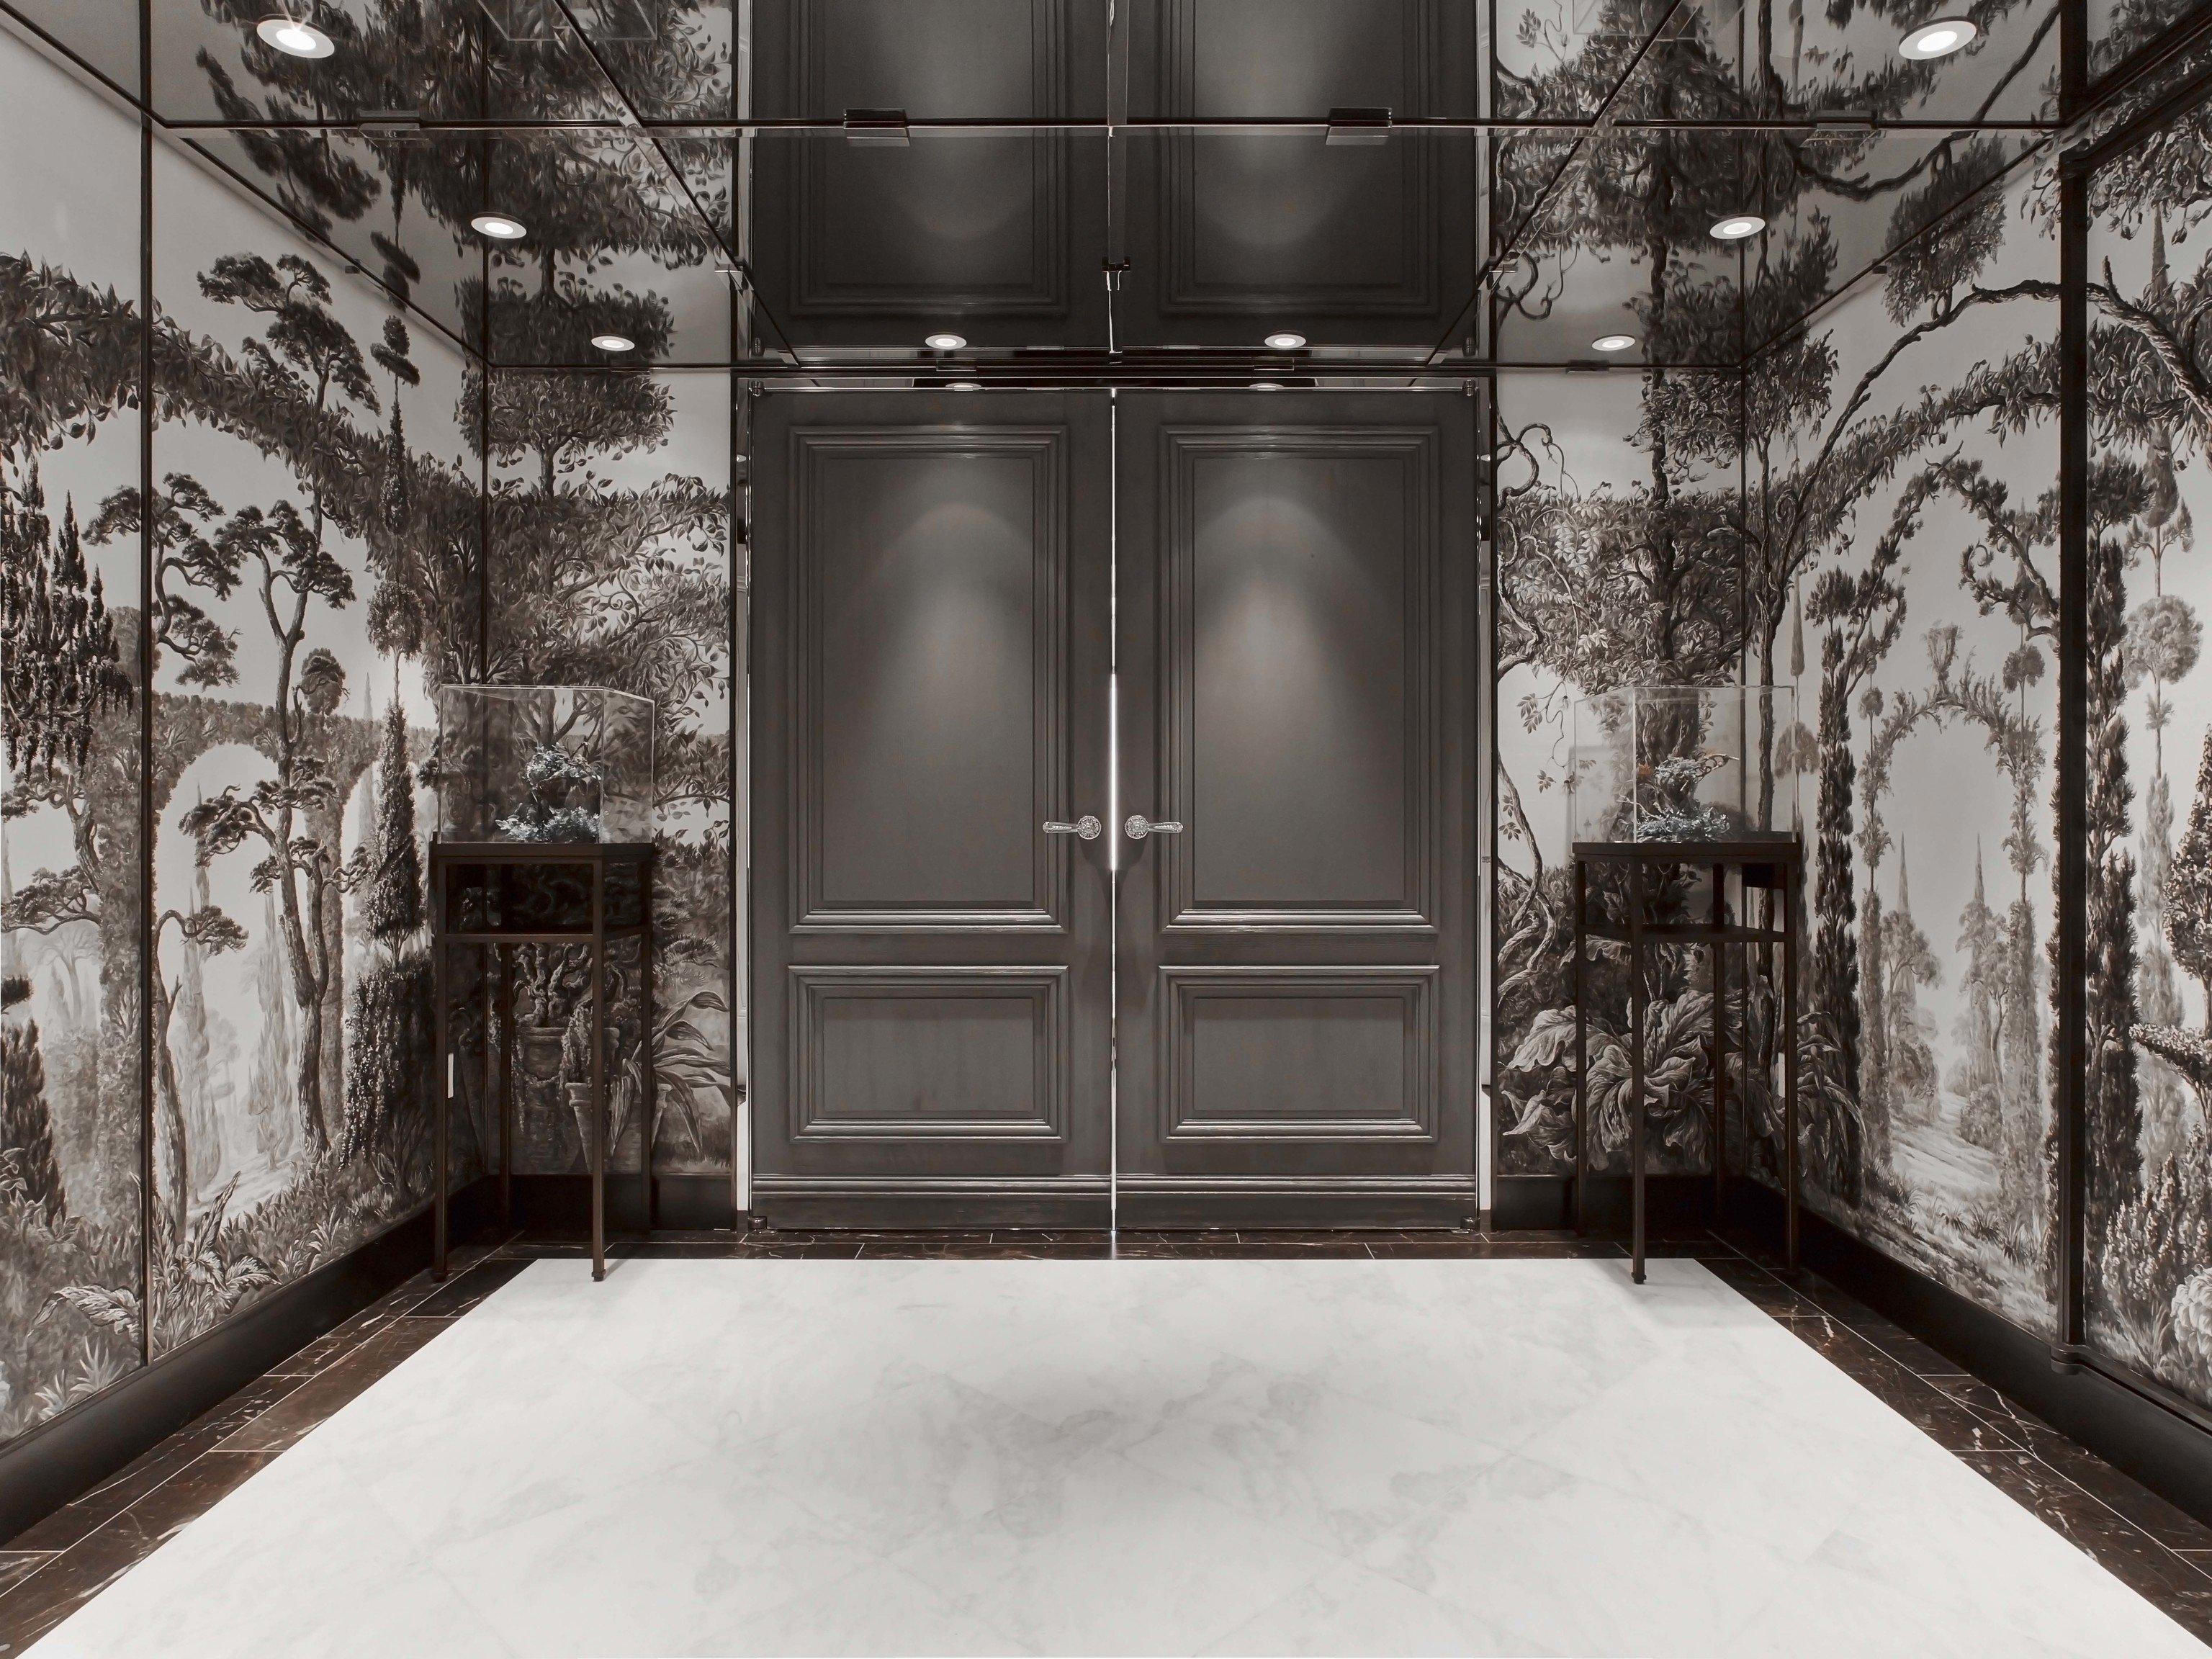 Hotels Luxury Travel wall window snow Winter interior design door black and white glass building